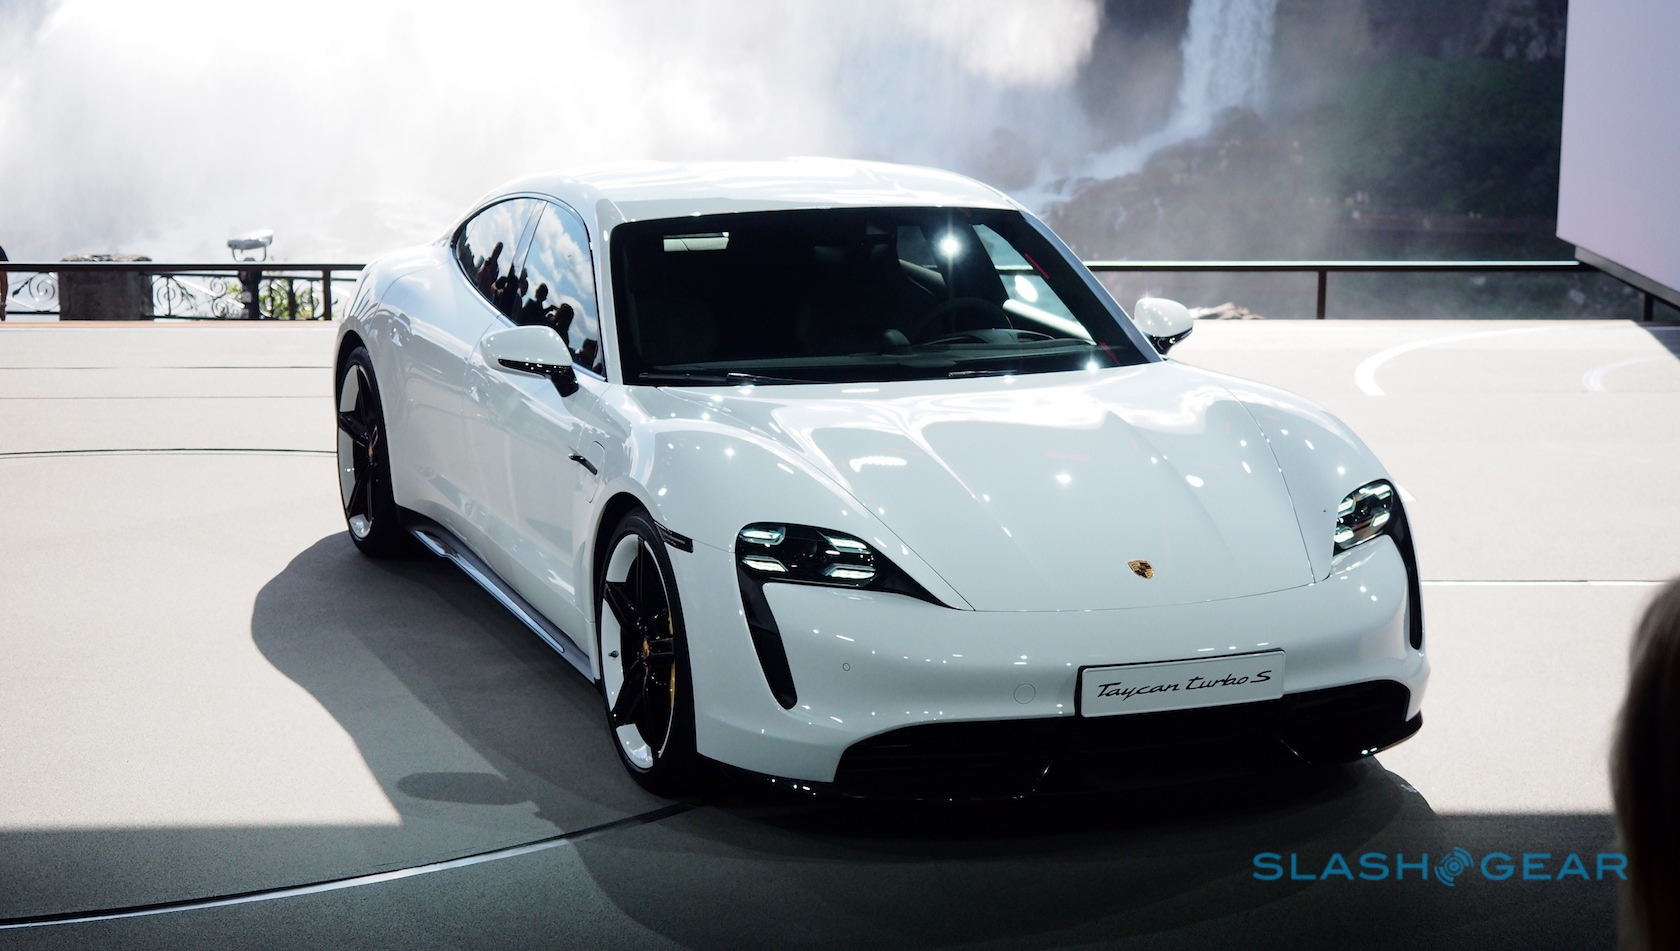 2020 Porsche Taycan Turbo Epa Range Surprise Prompts Damage Control Slashgear